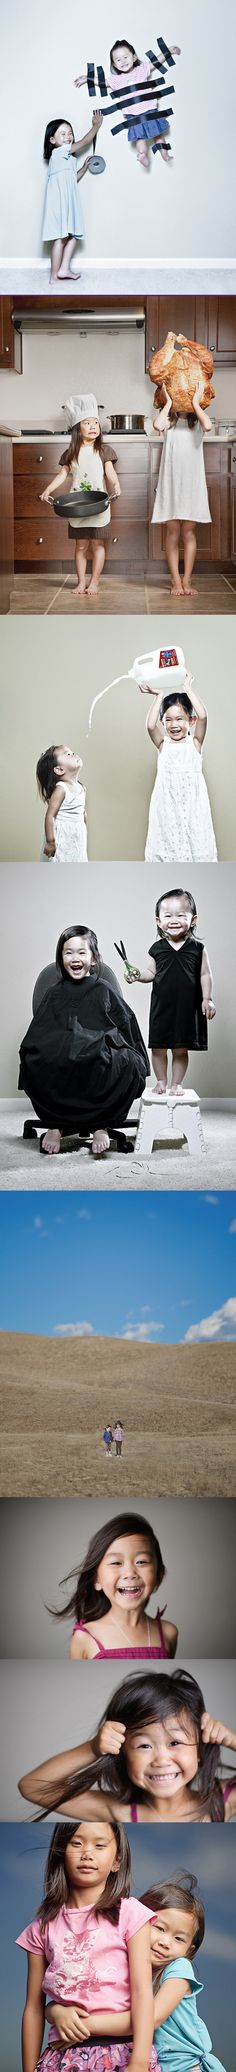 Wonderful photography of 2 adorable little girls, by father Jason Lee – http://kristinandkayla.blogspot.com.au/